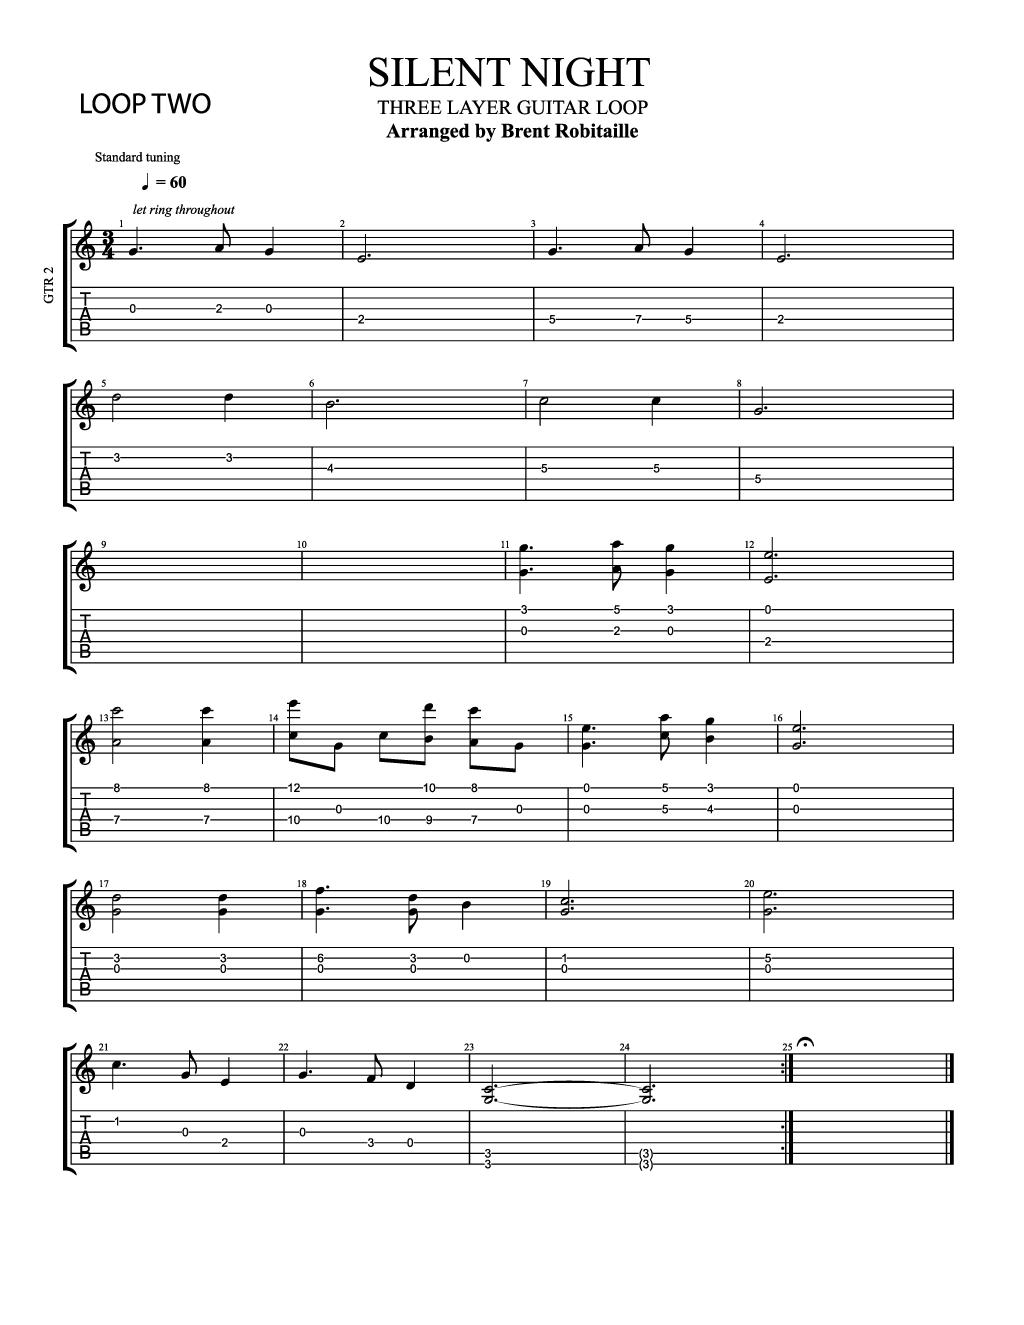 Silent-Night-Guitar-Looper-Pedal-Loop-Two